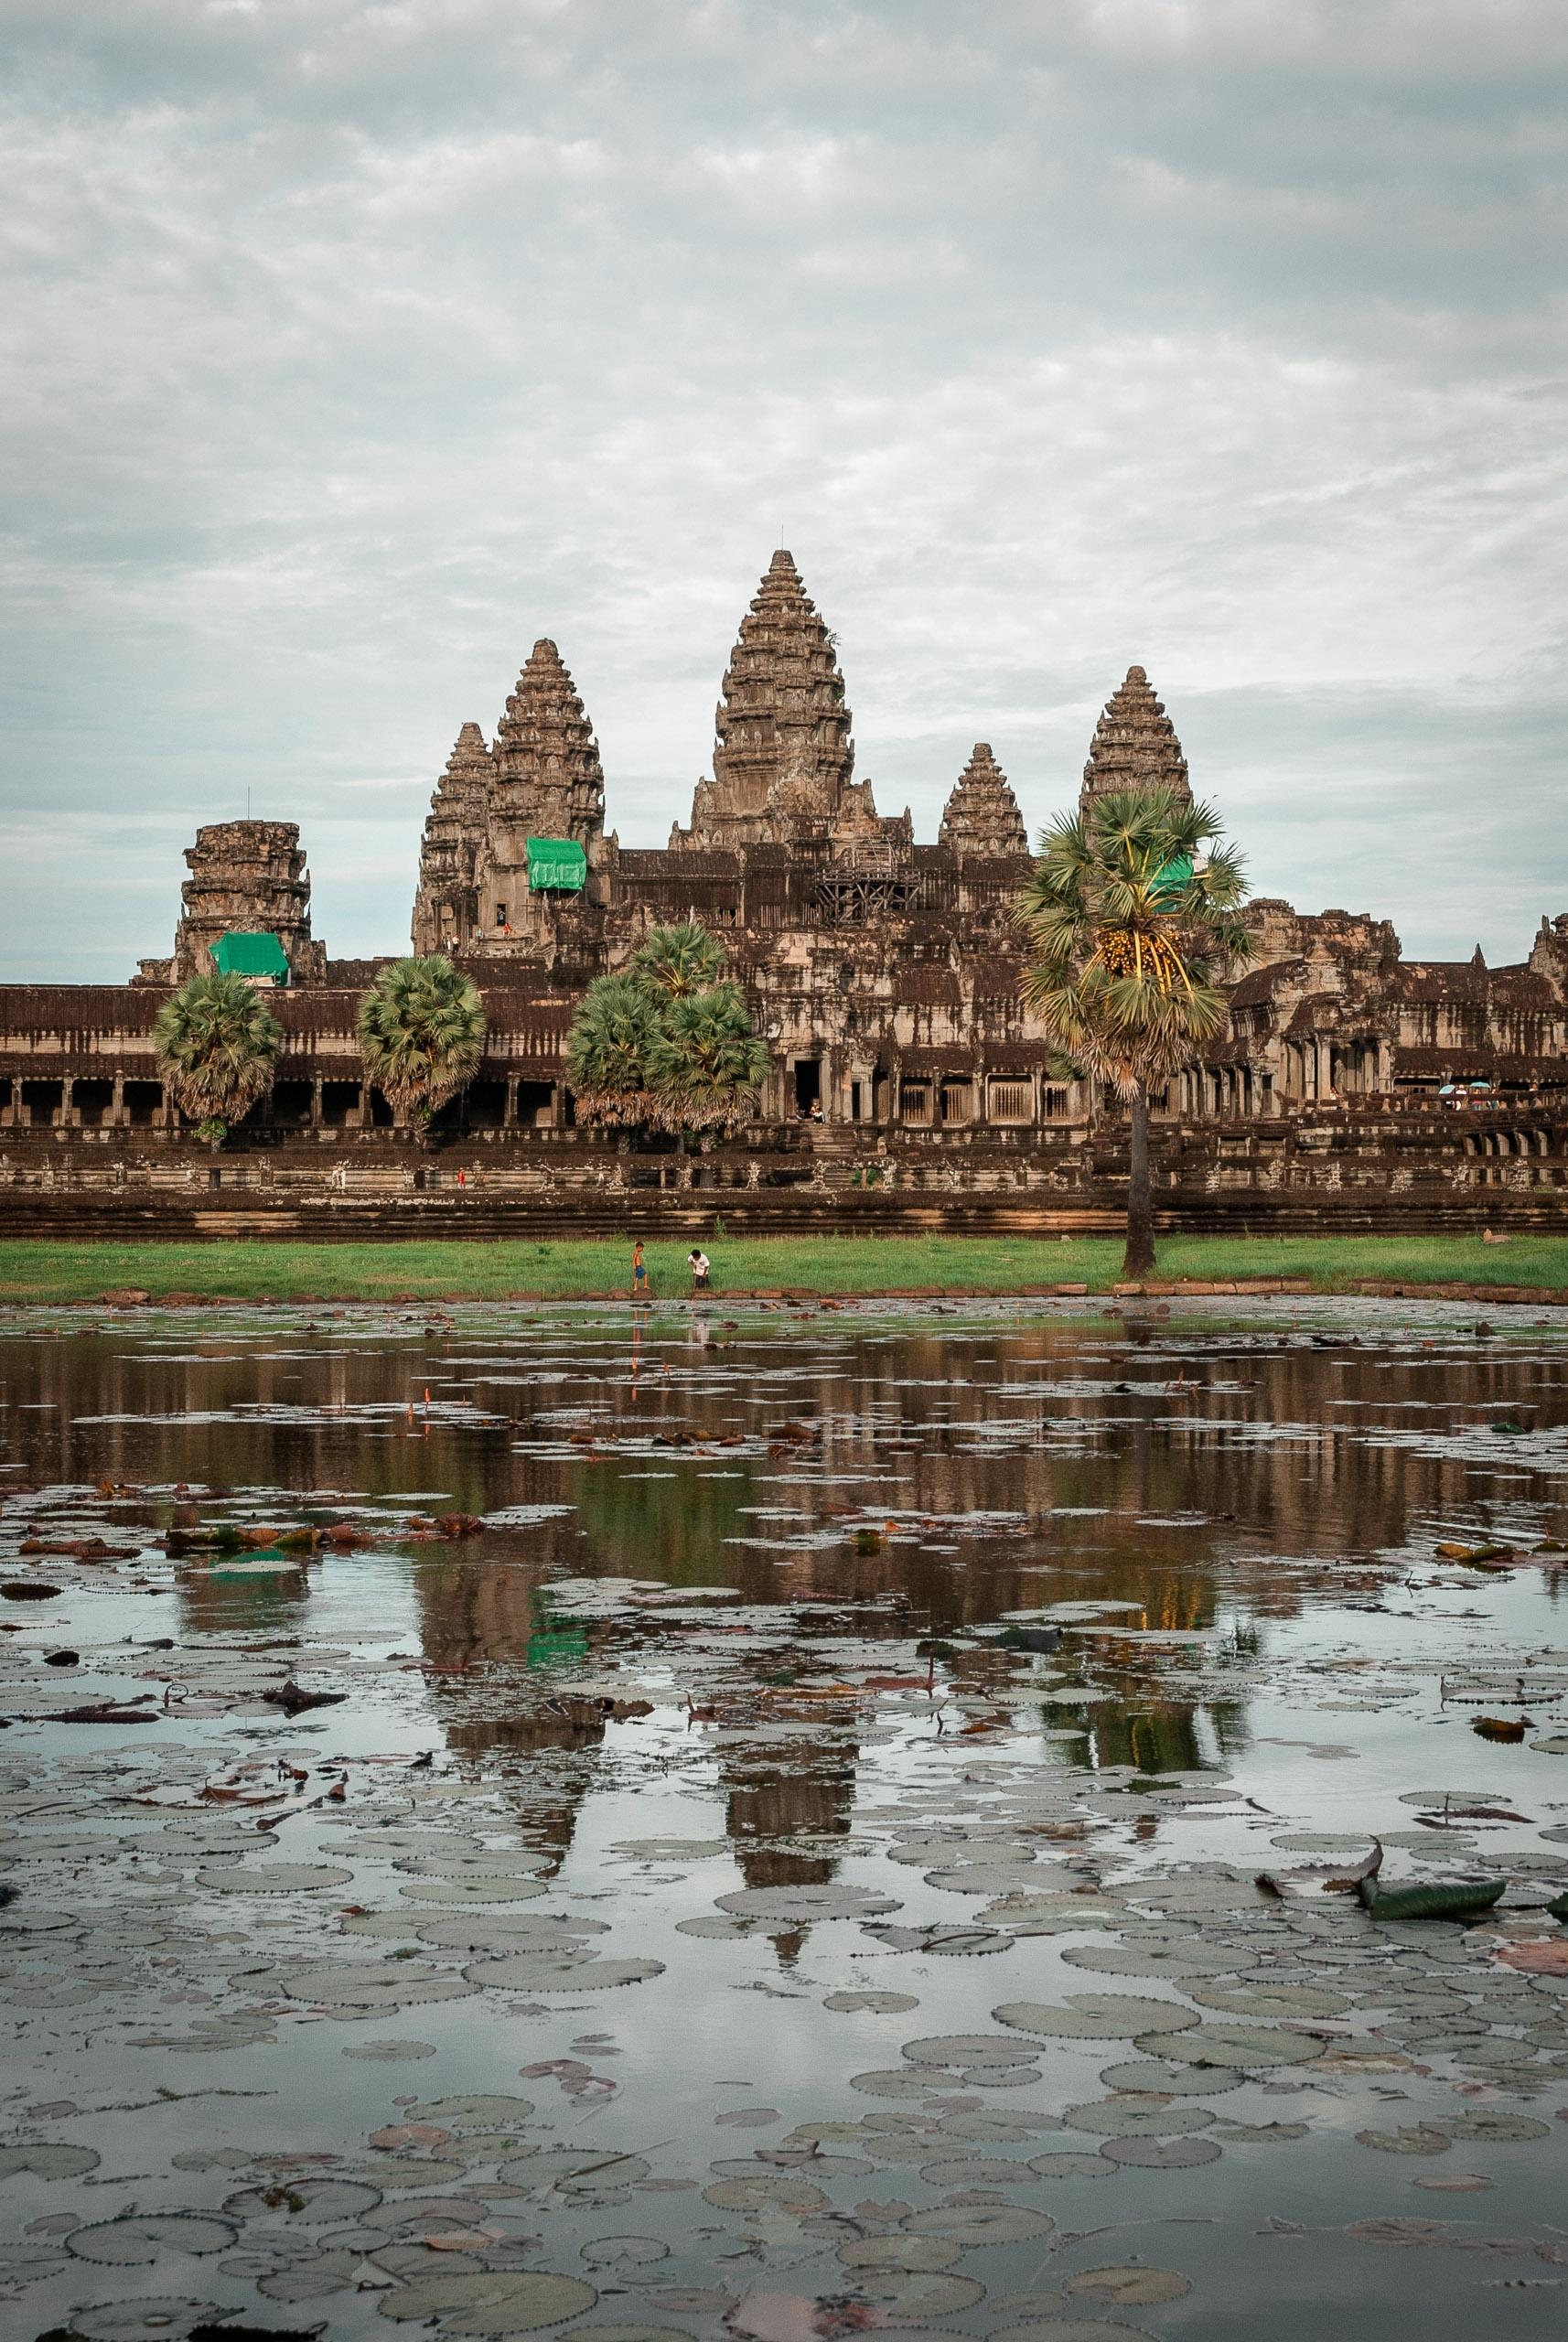 Cambodia - Angkor Wat - 2007-0626-DSC_0133_579